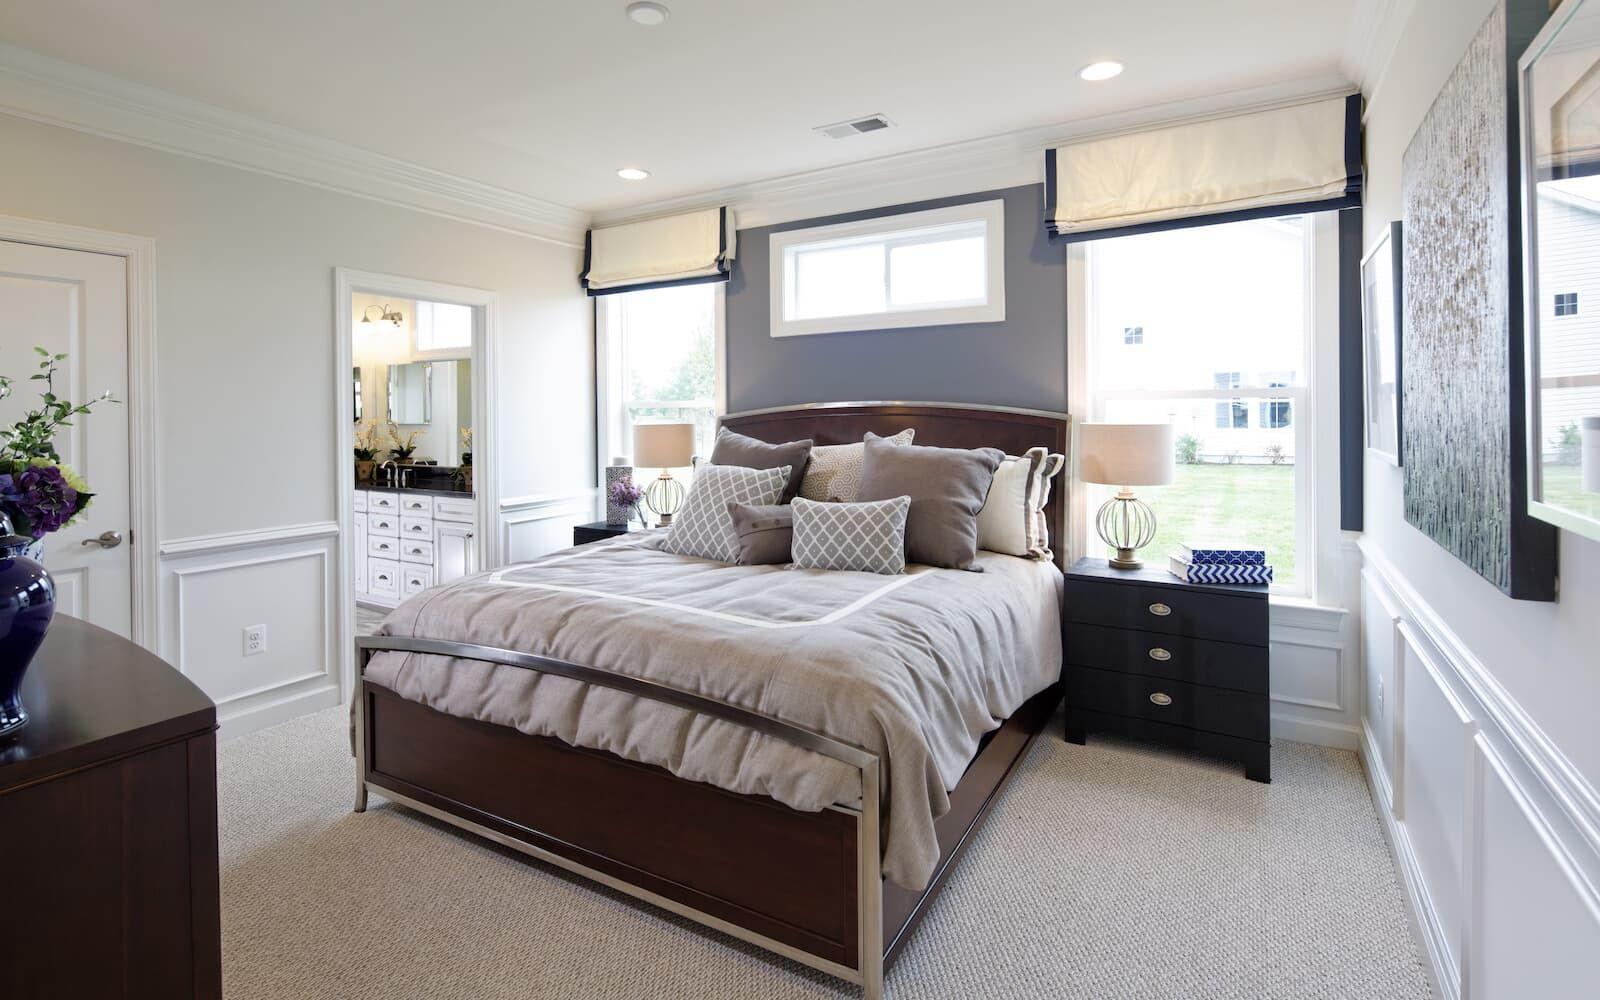 Bedroom featured in the Bridgeport II By Brookfield Residential in Eastern Shore, MD